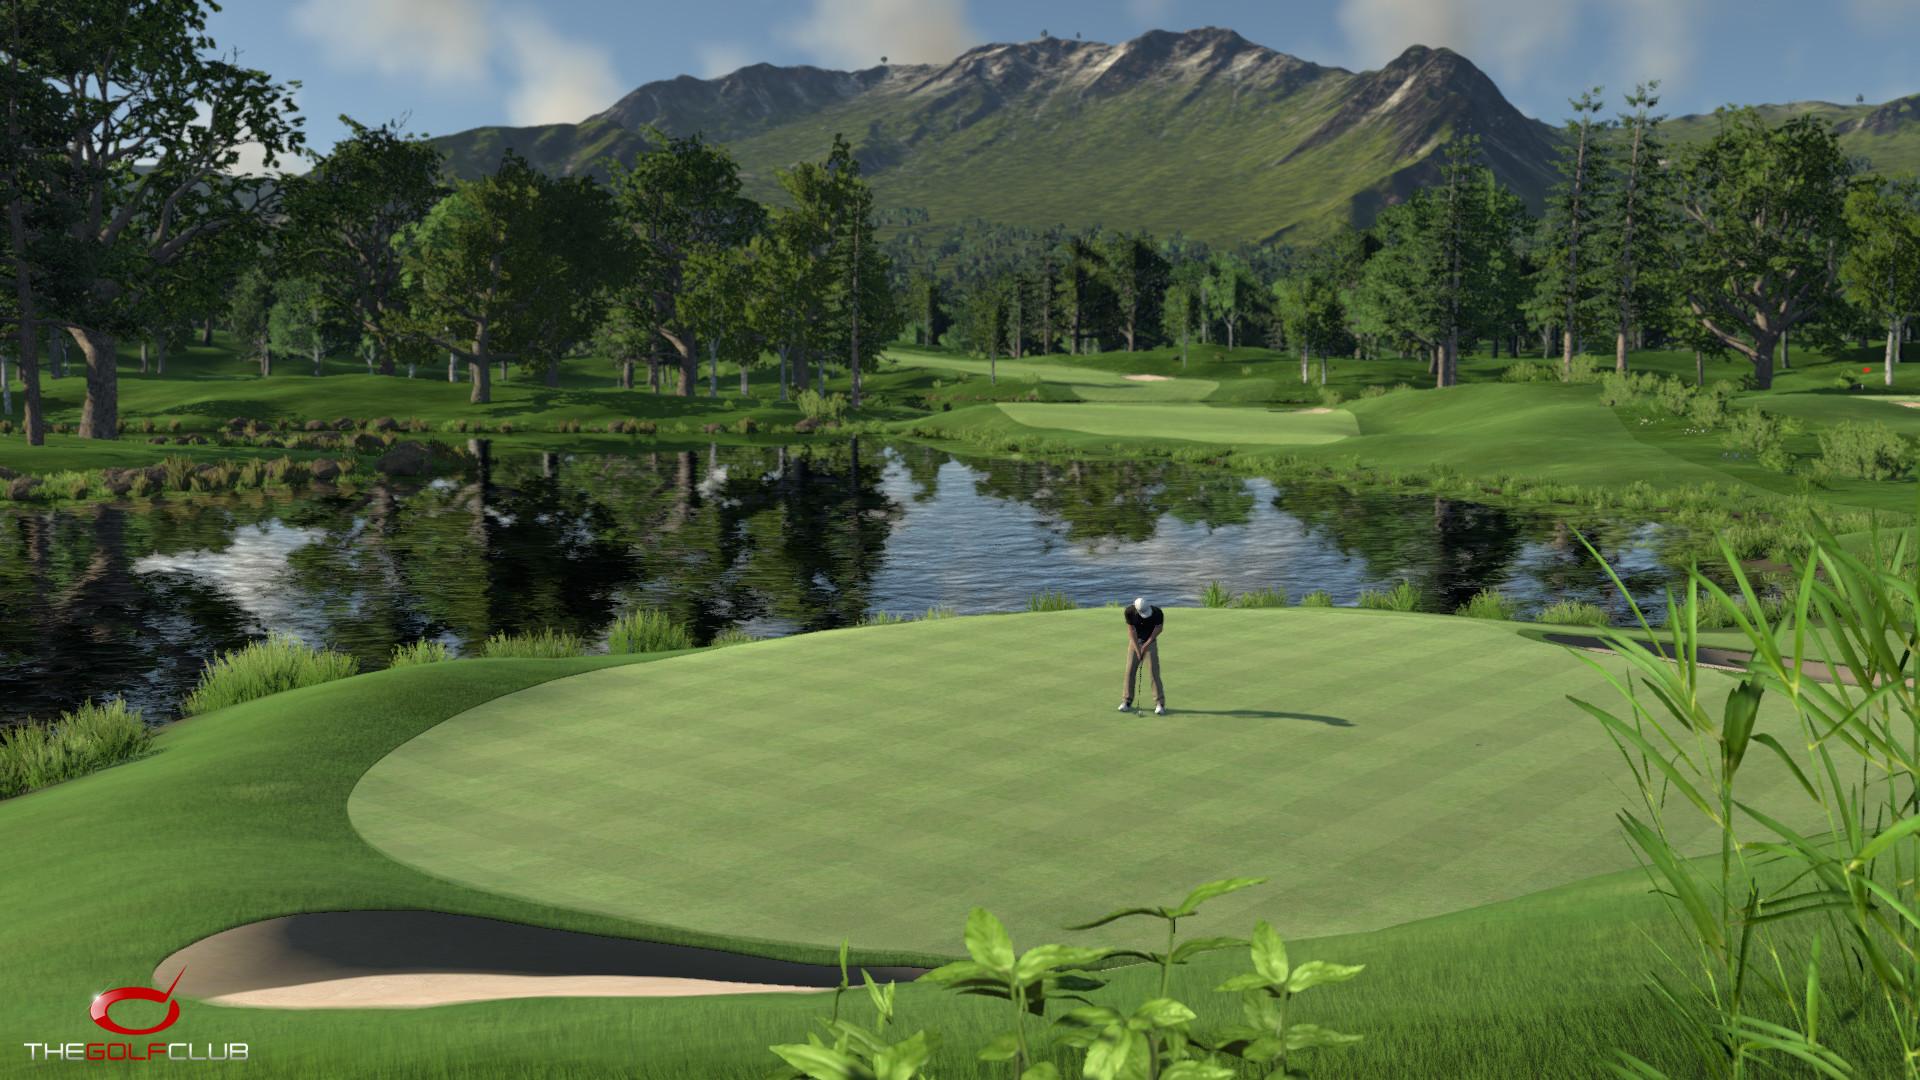 Res: 1920x1080, The Golf Club Wallpaper 02 1280×738 – Nexus 4. The Golf Club Wallpaper 02  1280×720